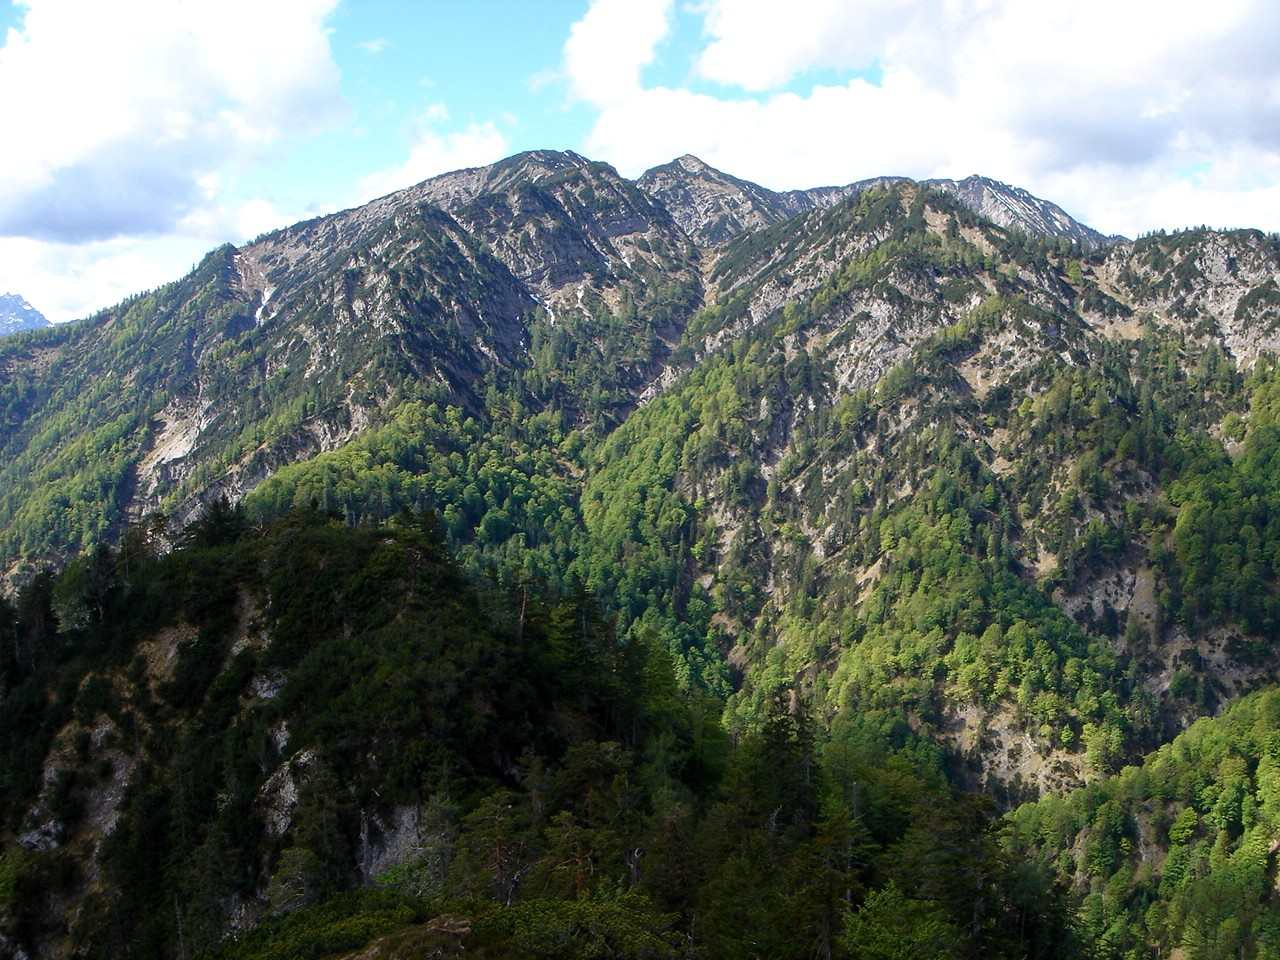 Foto: Manfred Karl / Mountainbike Tour / Saurüsselkopf (1270m) / Blick gegen Kreuzschneid, Wildalphorn, Dürrnbachhorn / 16.06.2007 09:49:51